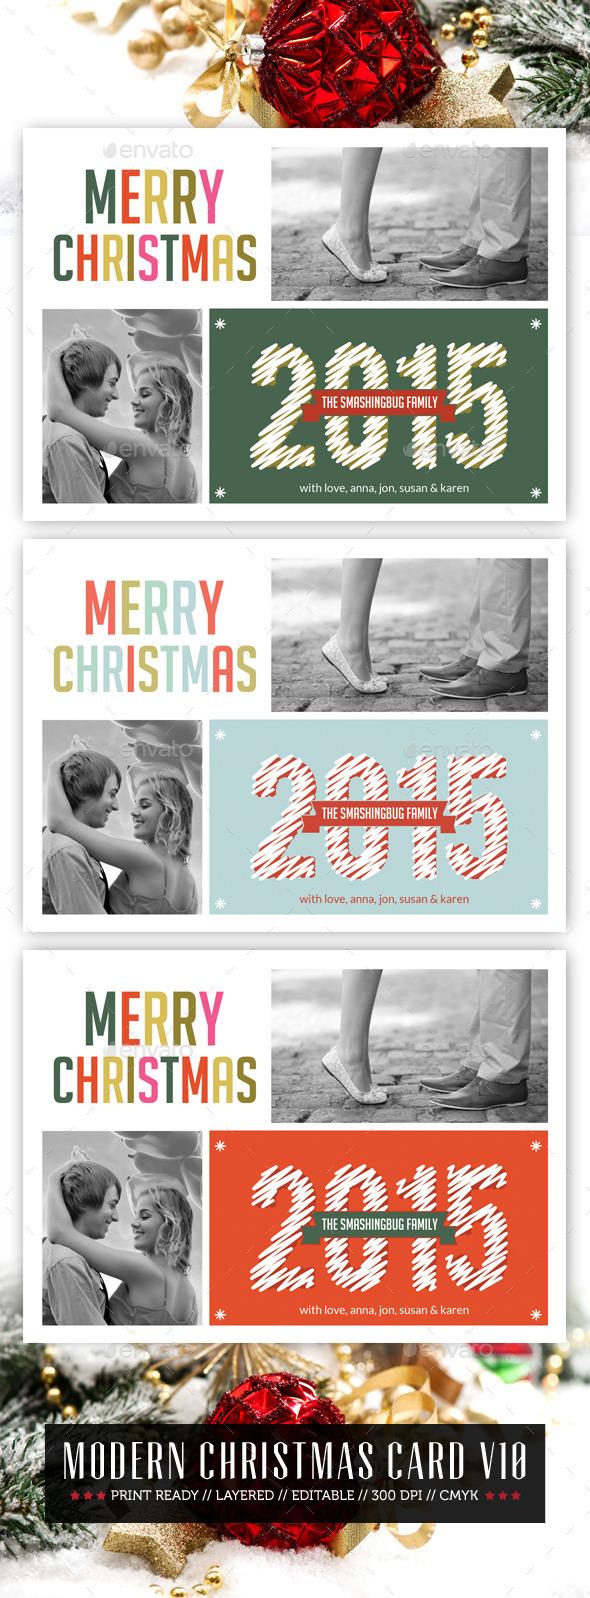 GraphicRiver Modern Christmas Card V10 9537235